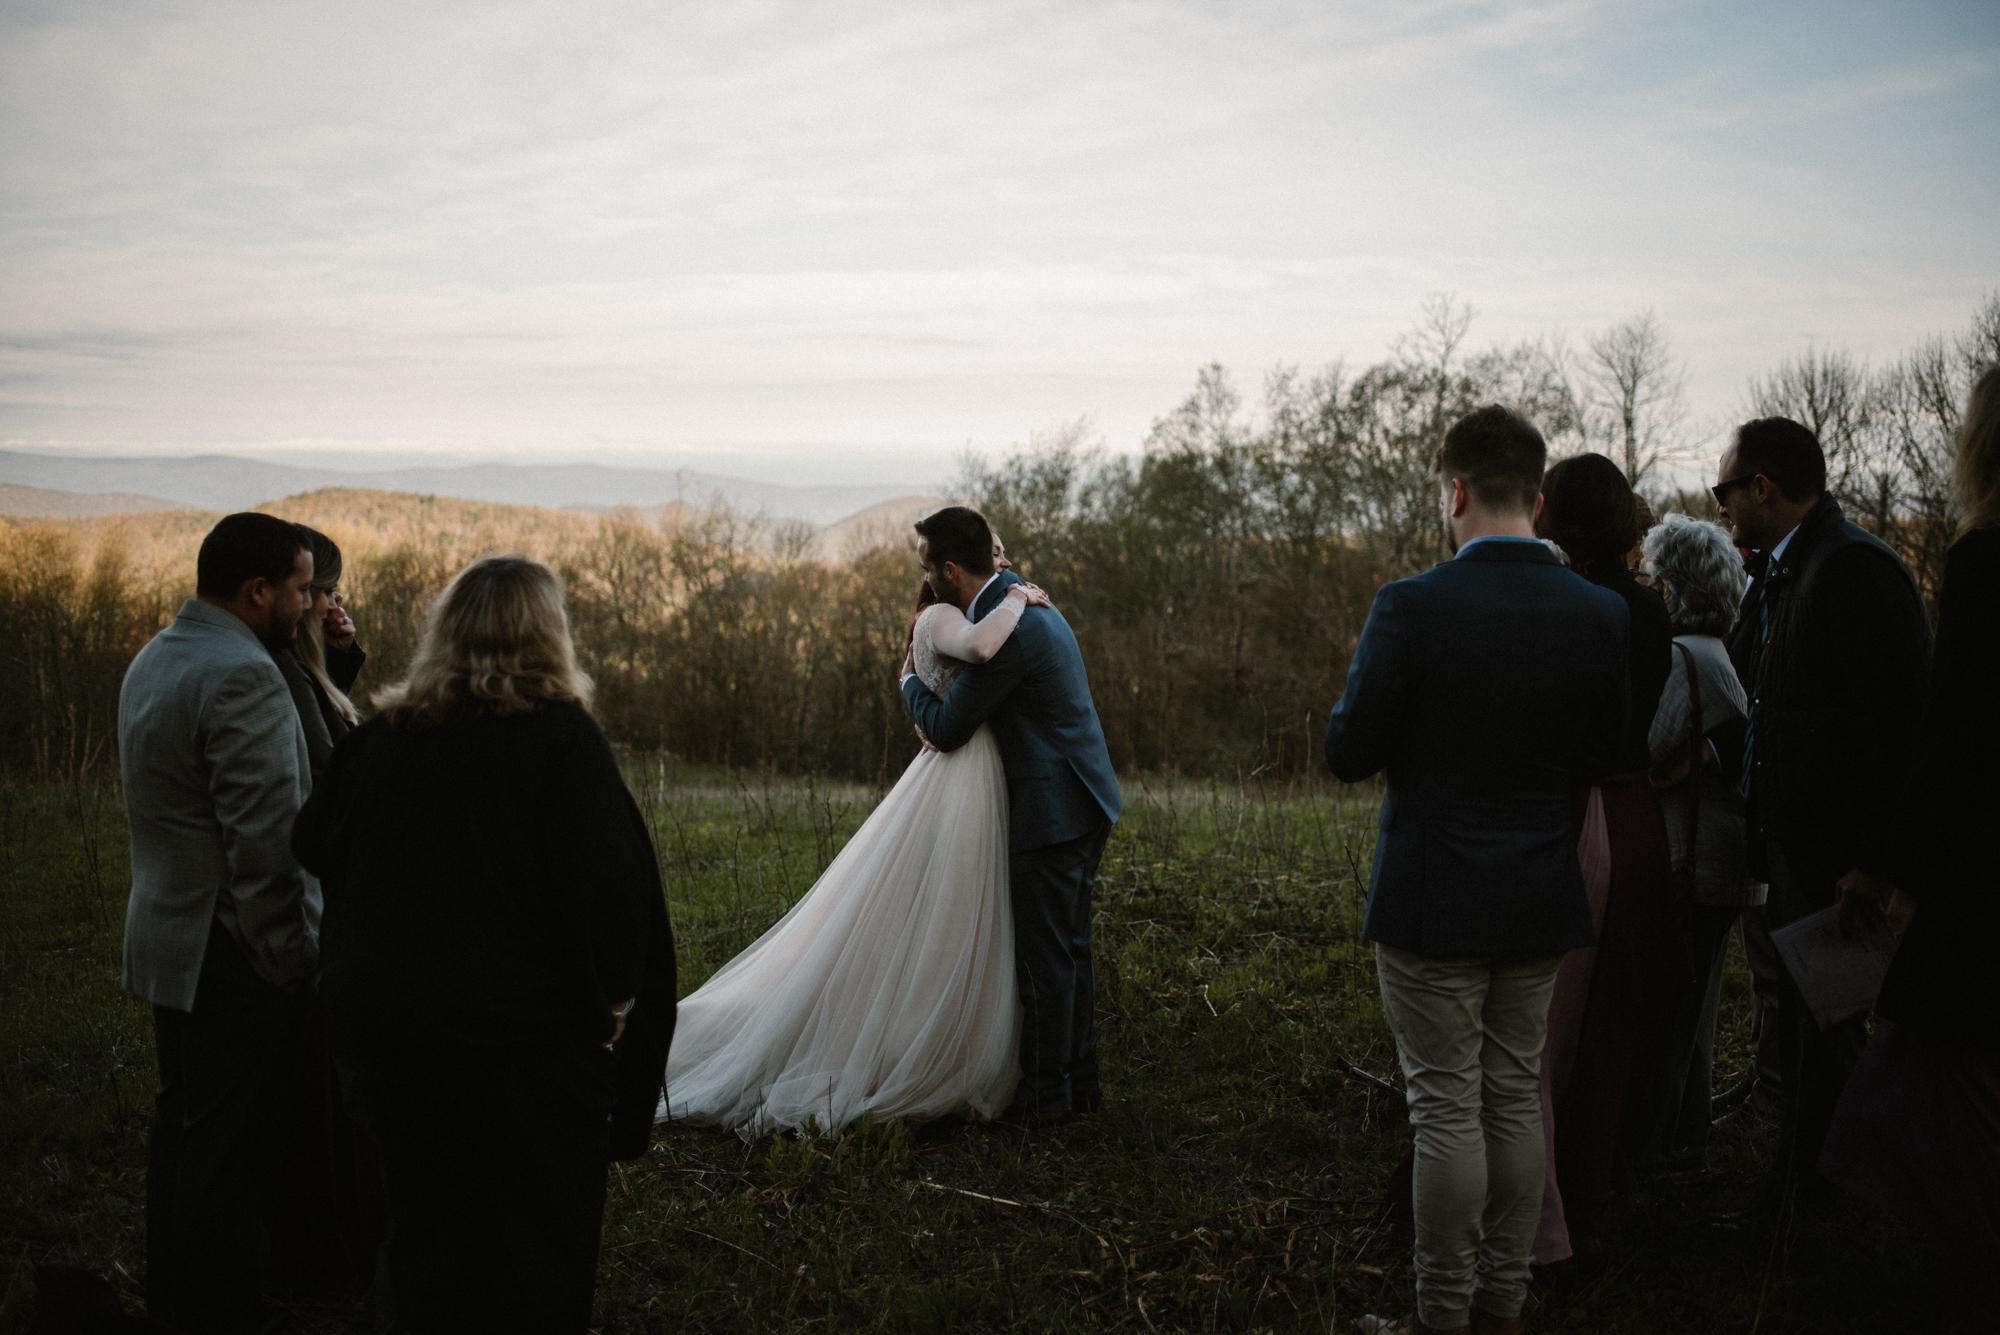 Paula and Andrew - Small Adventurous Wedding in Shenandoah National Park - Blue Ridge Mountain Wedding - White Sails Creative - Mountain Elopement_20.jpg